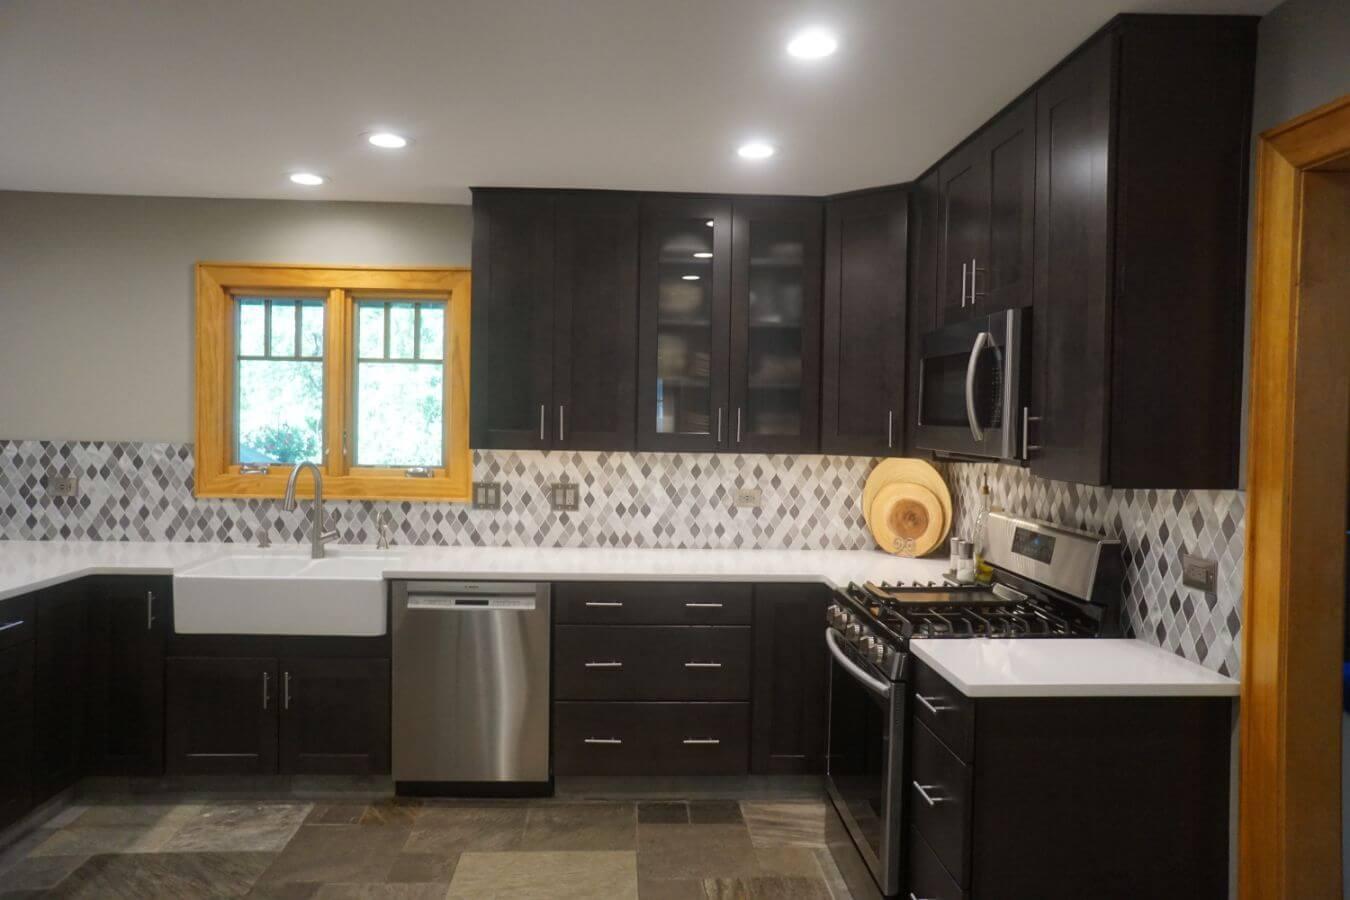 Kitchen Remodel Contractors Naperville